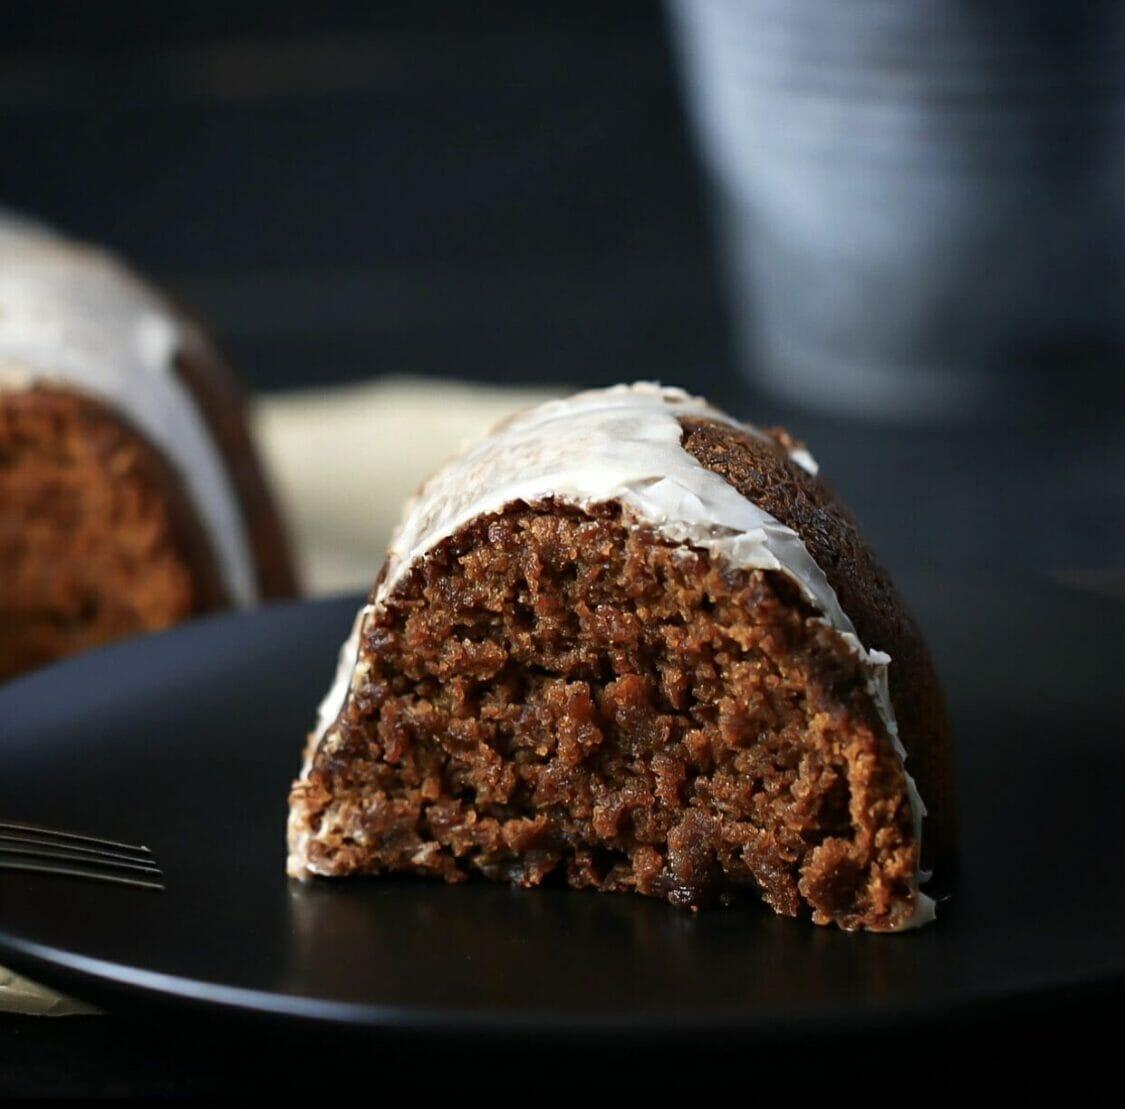 Gingerbread gluten free cake recipe a delicious gluten free cake